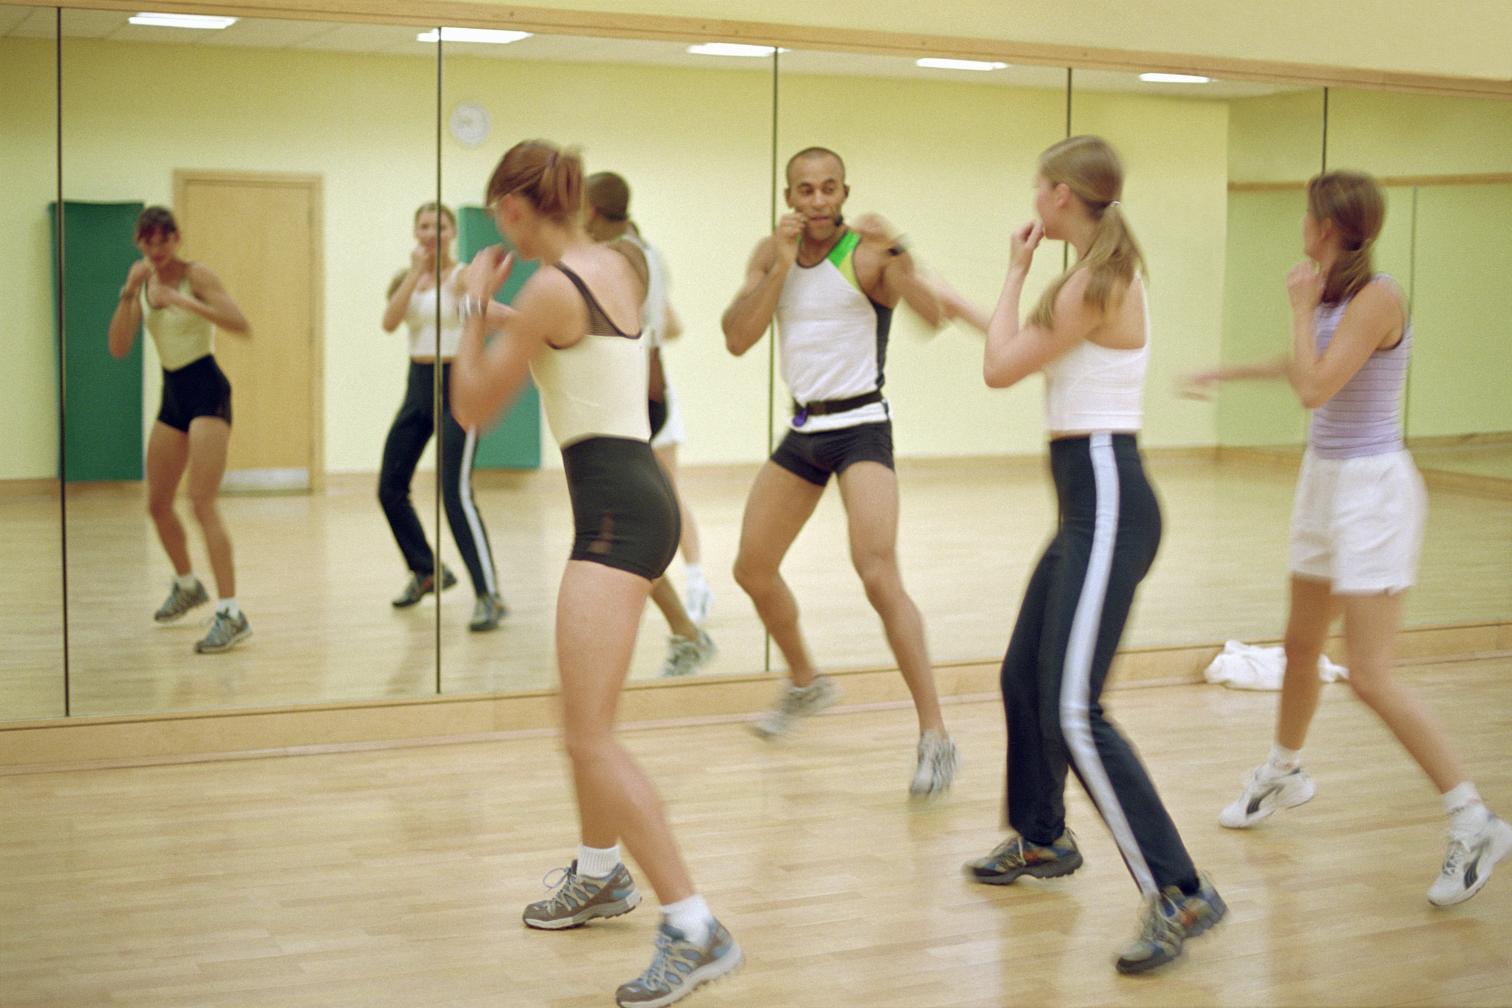 Fitnessstudiogruppe mit Trainer